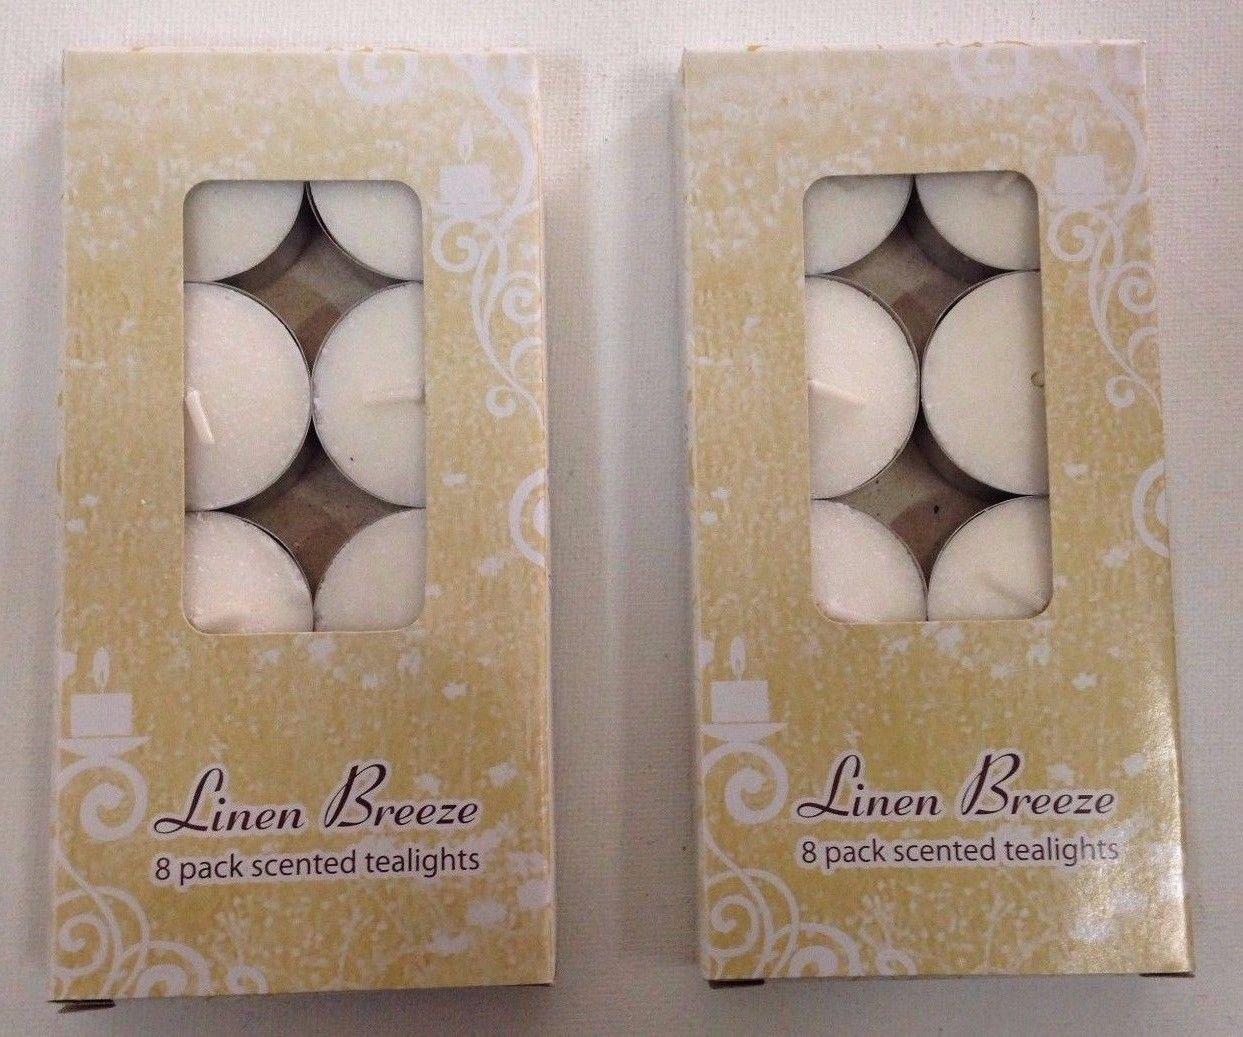 16-Pack Linen Breeze Scented Tea Lights Candles